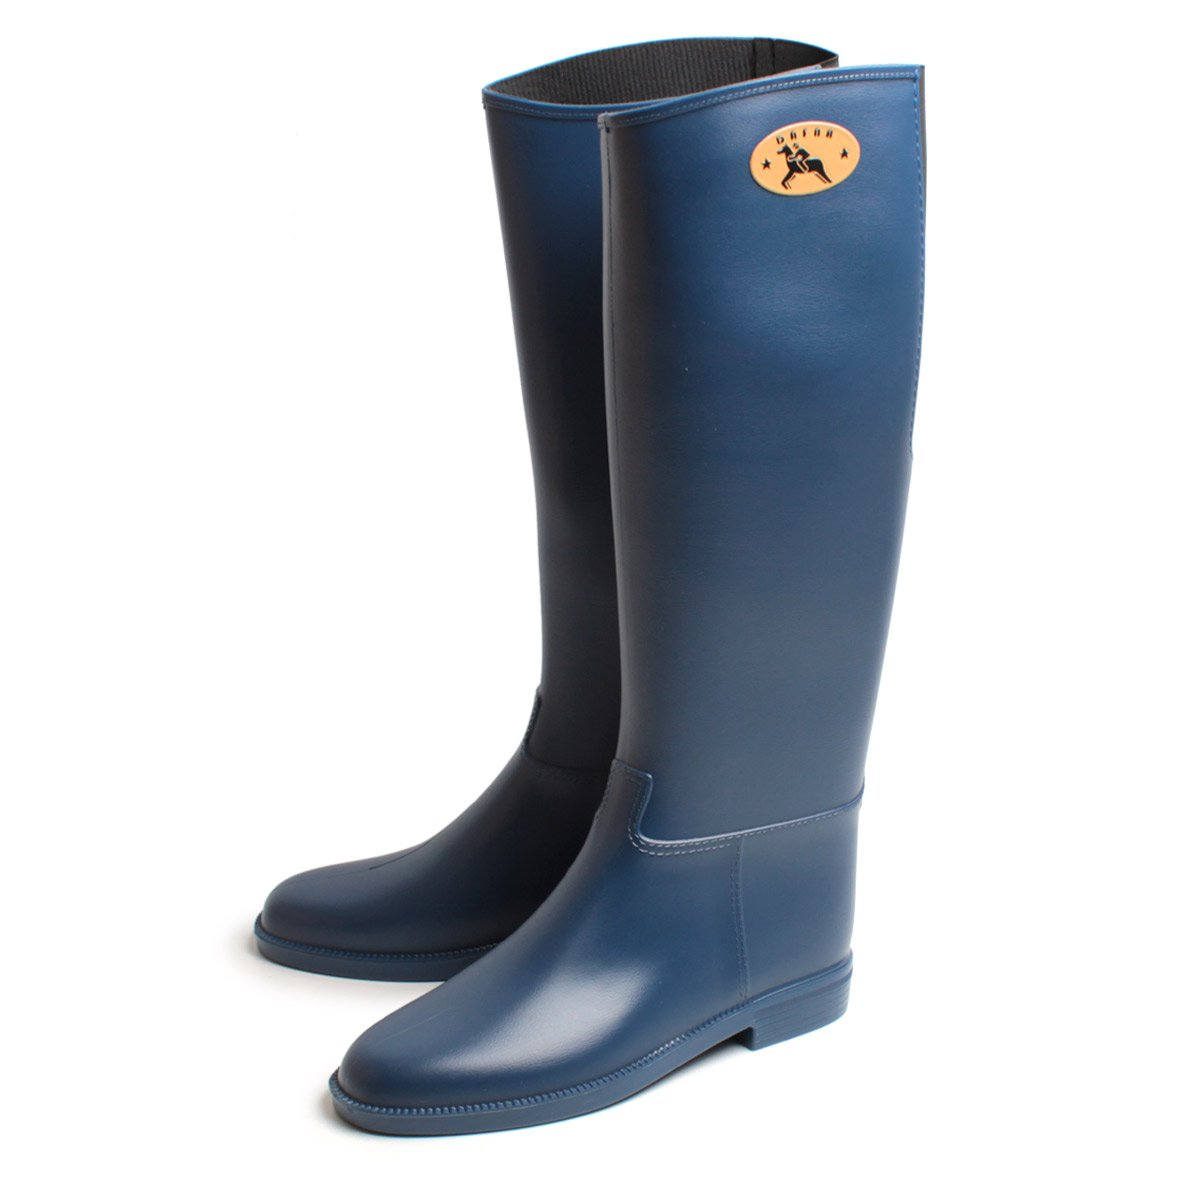 dafna(ダフナ) Dafna Winner Dolly(Flex Boots)